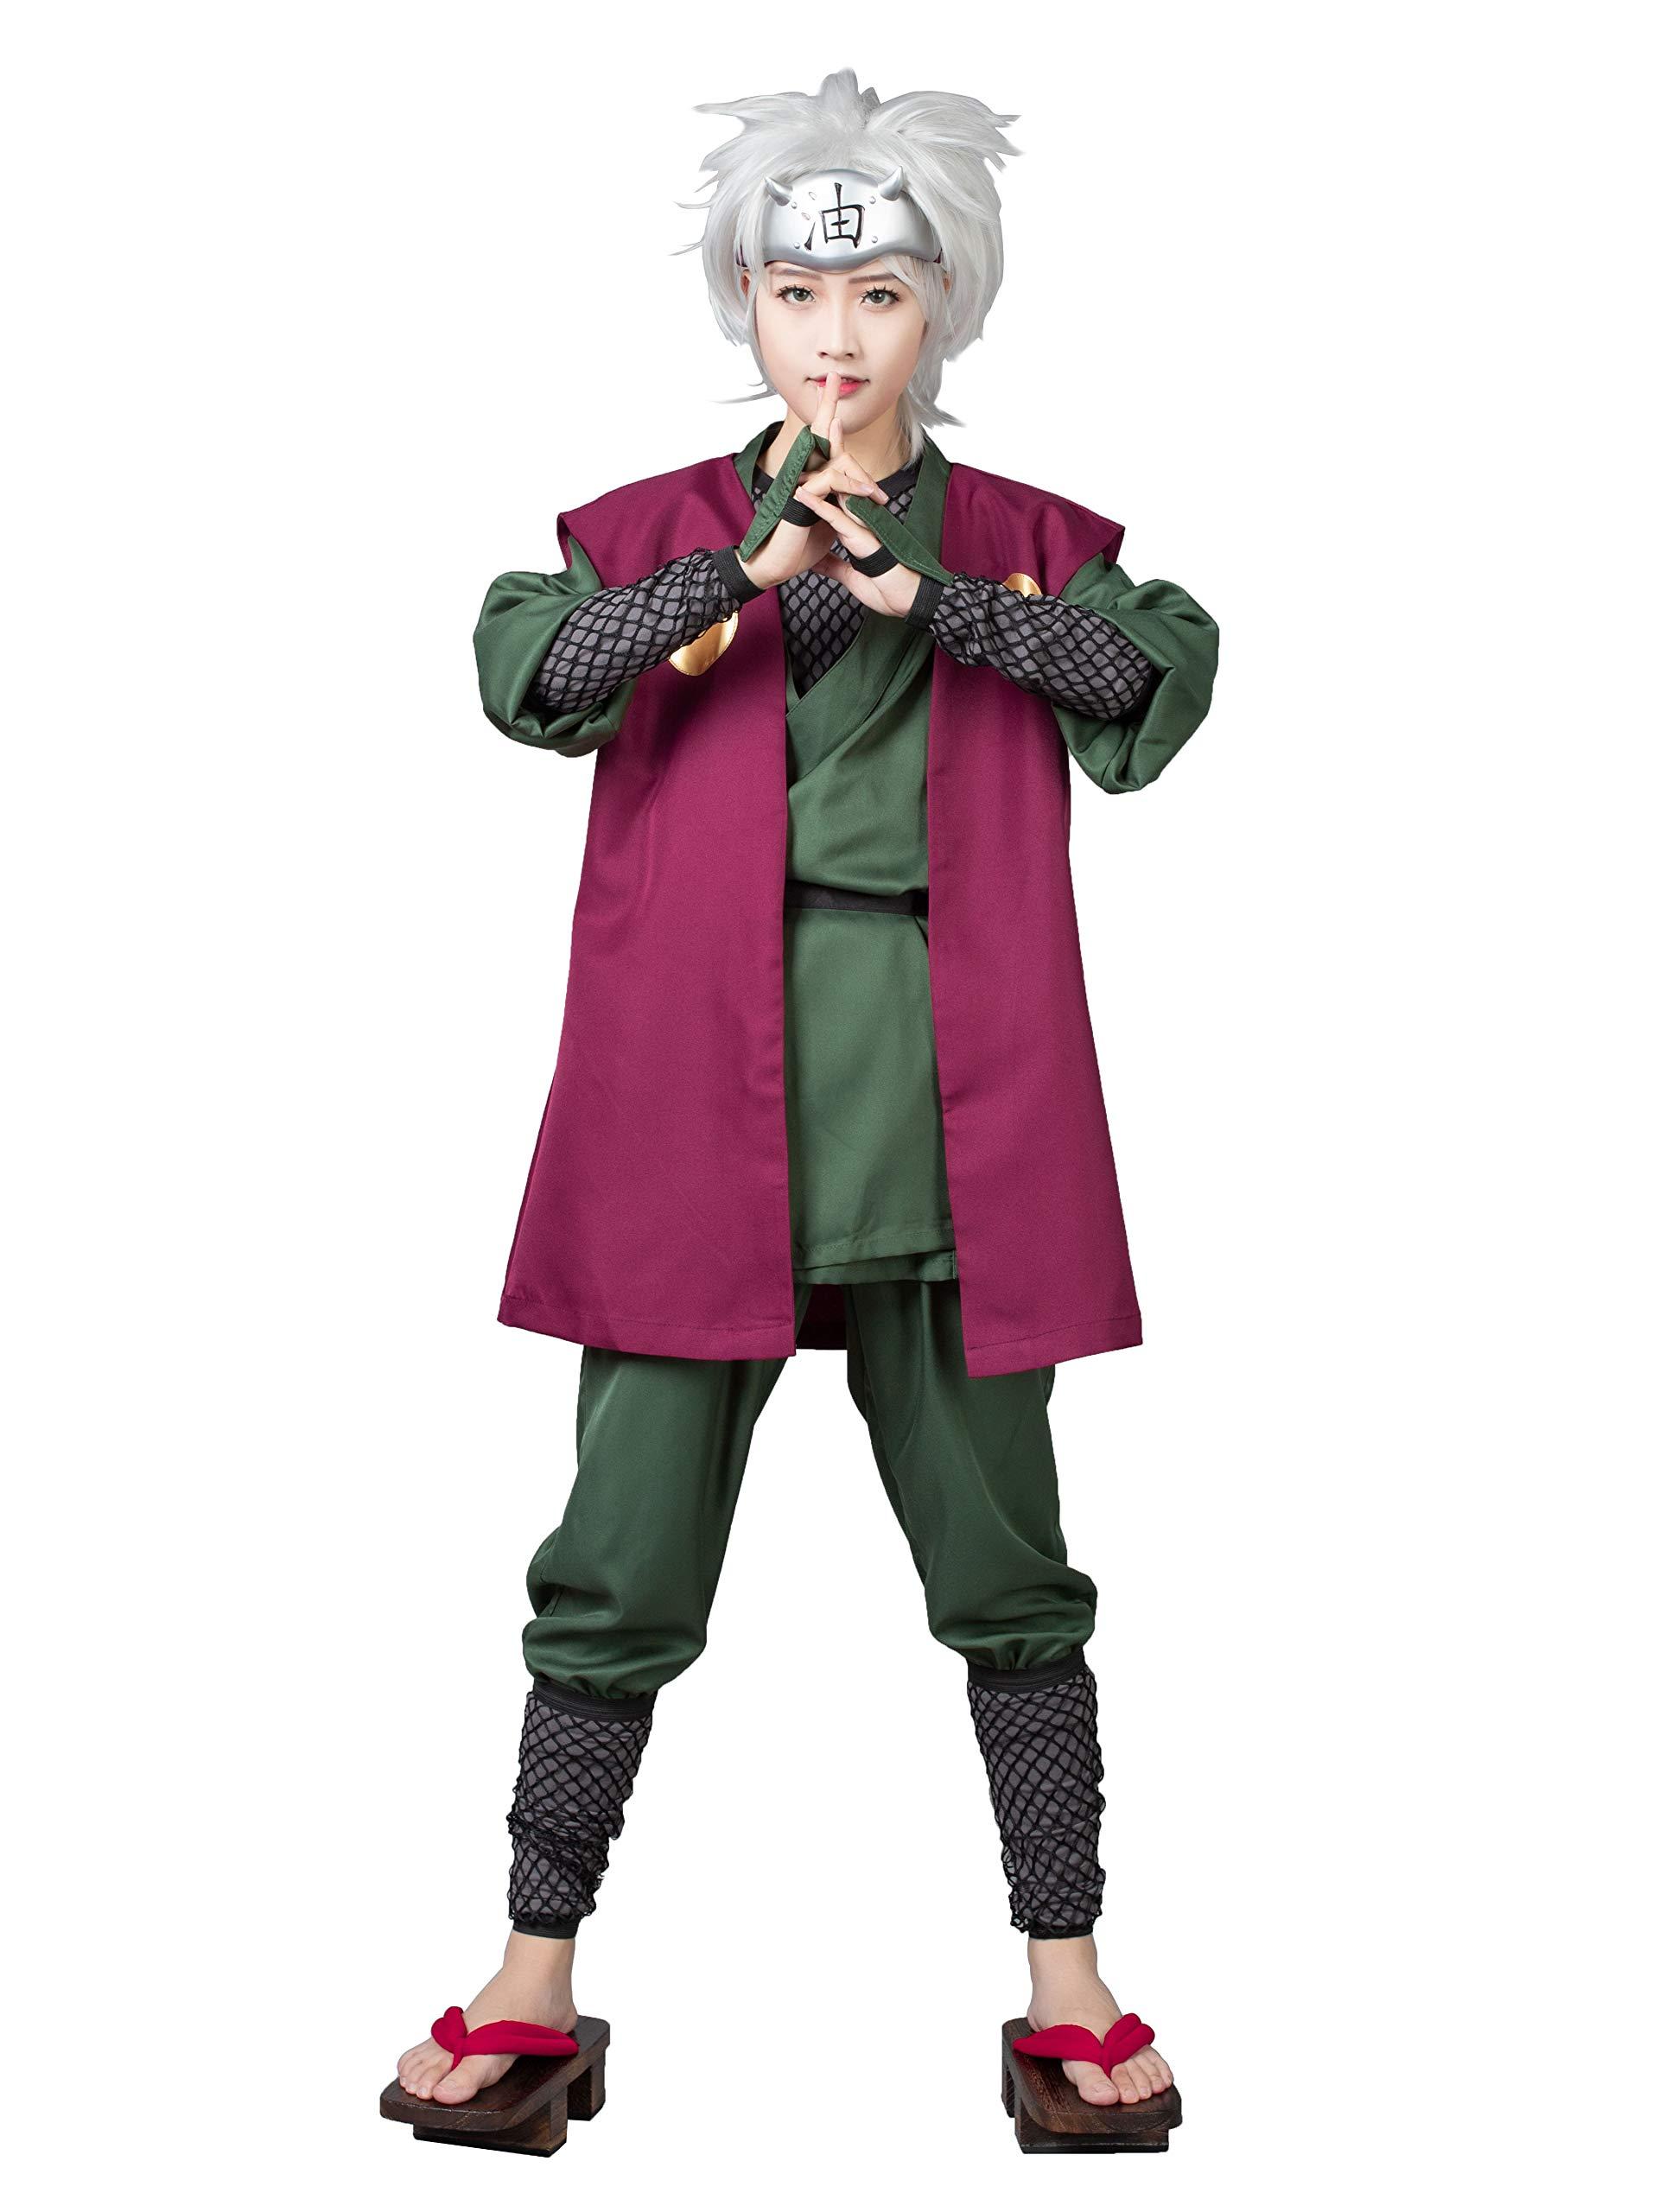 CosFantasy Japanese Anime Ninja Jiraiya Cosplay Costume mp000314